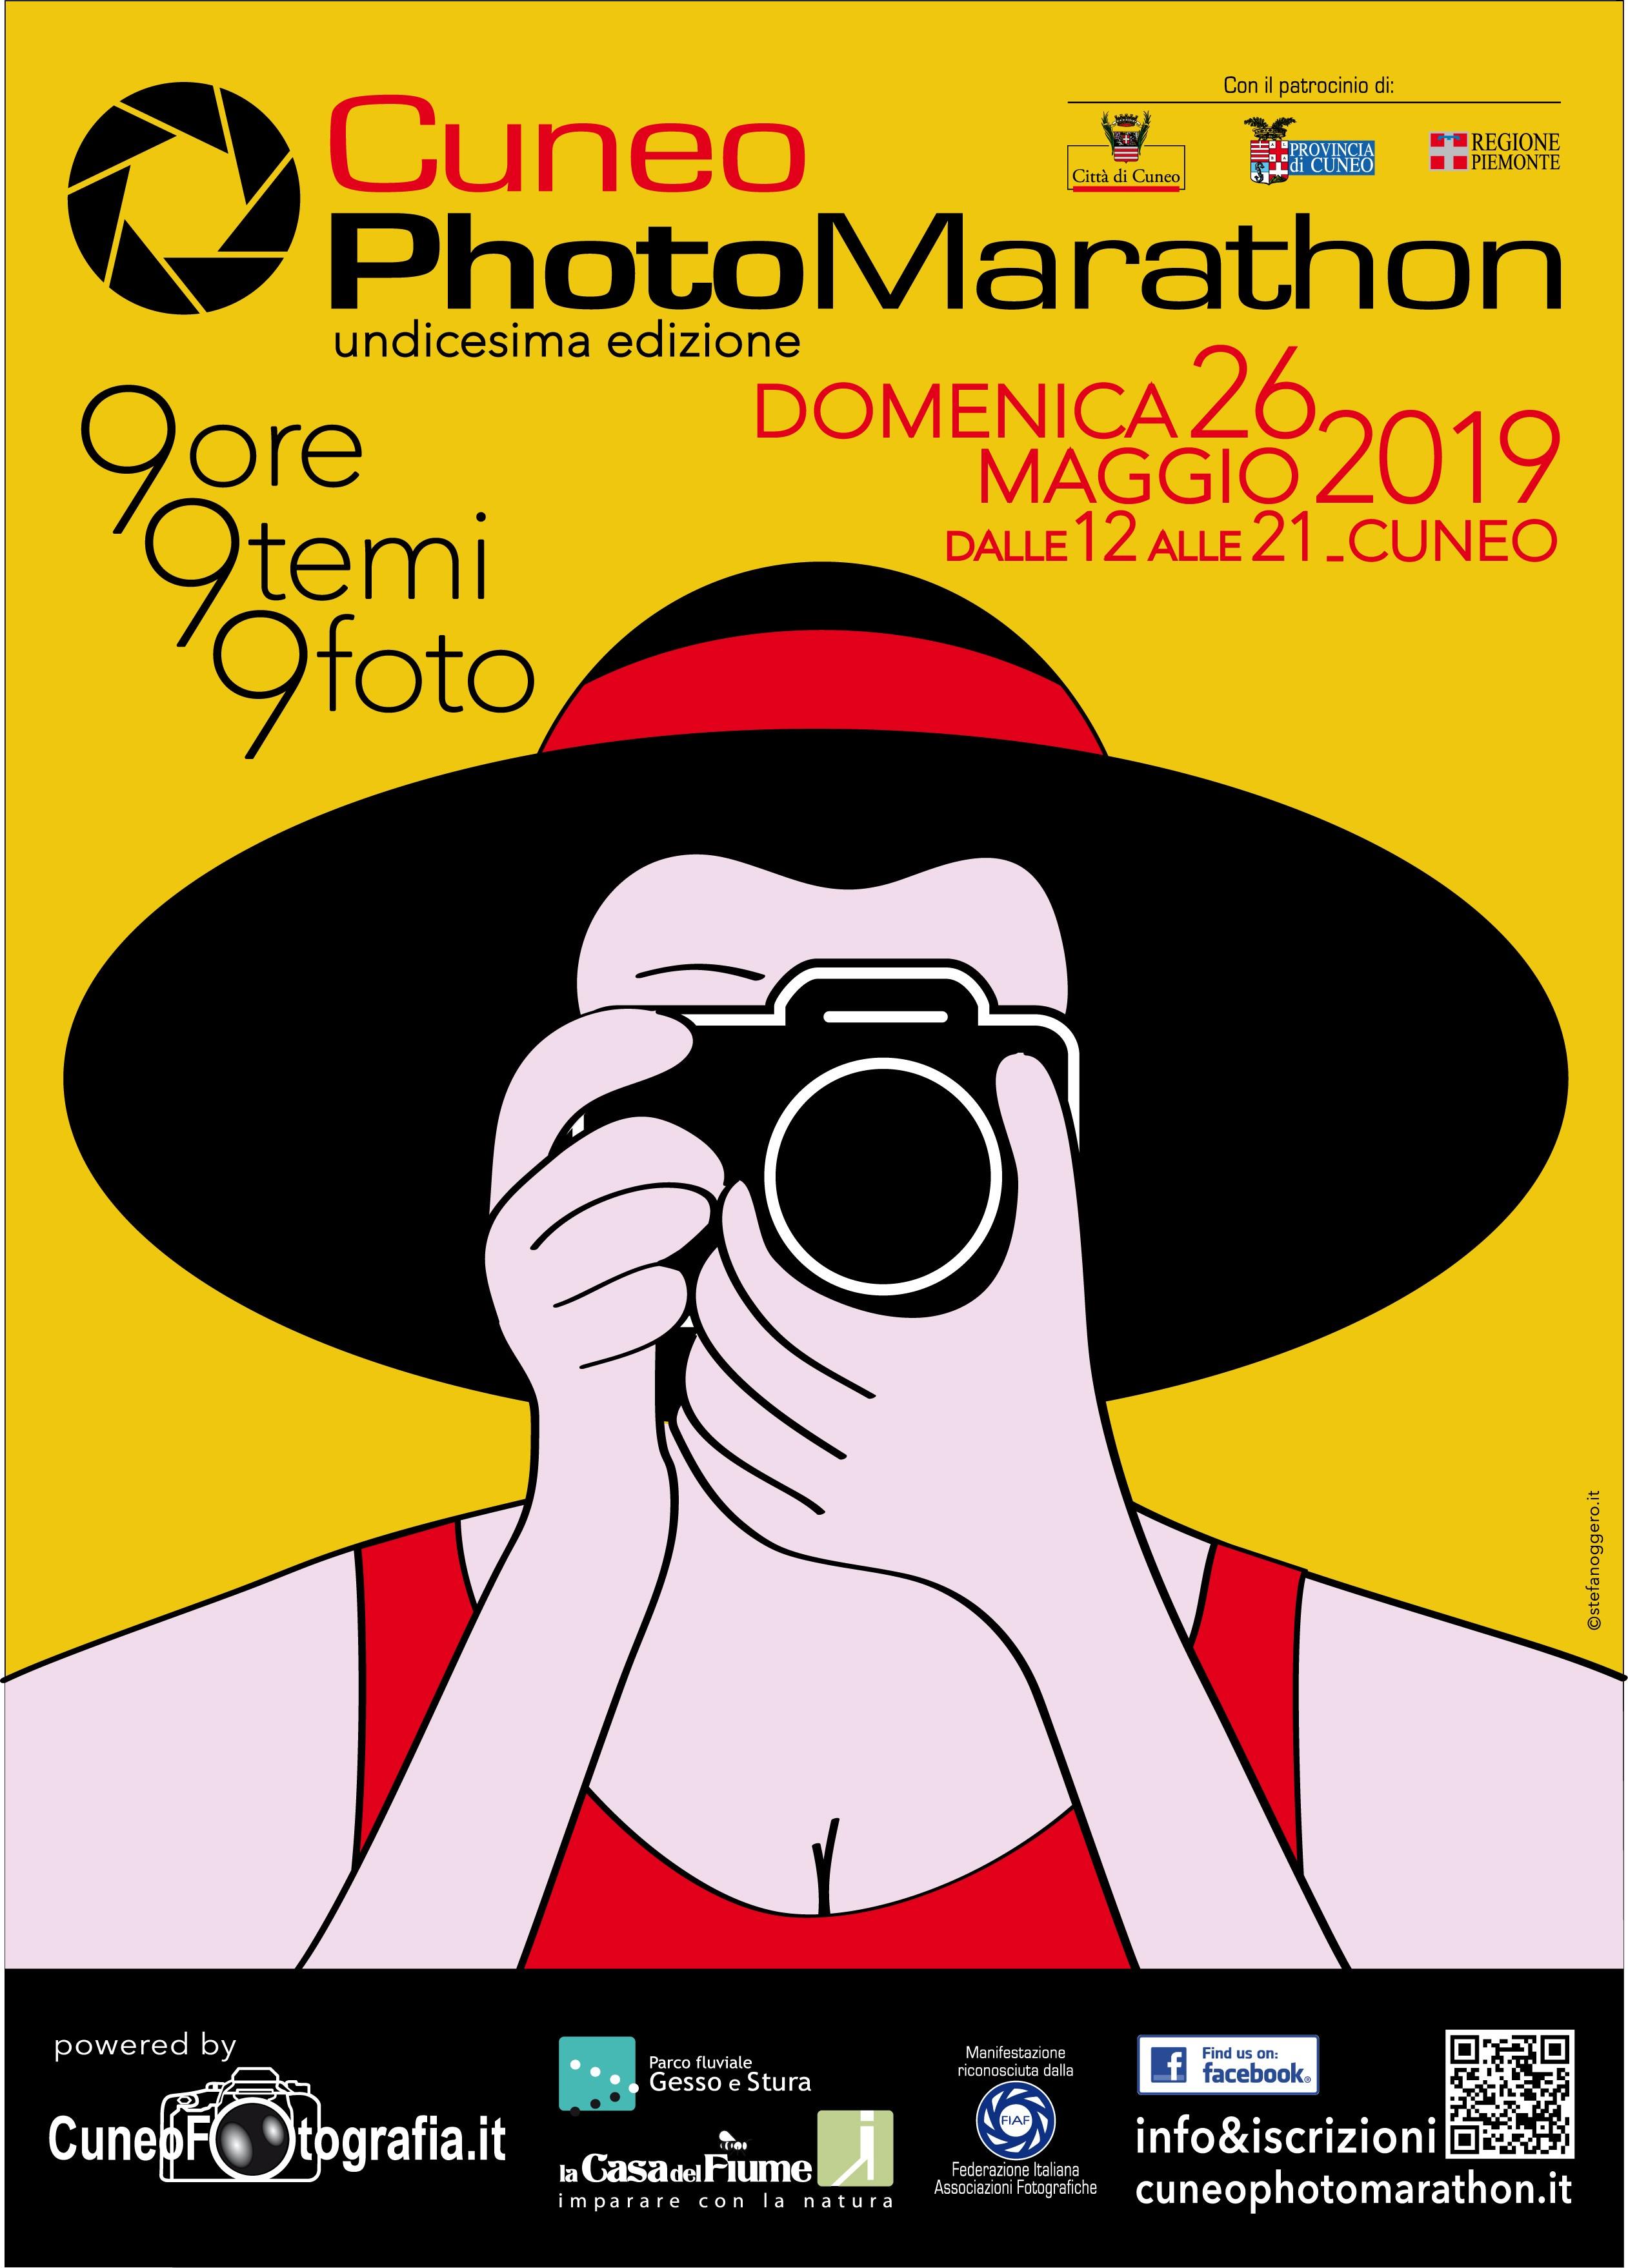 CuneoPhotoMarathon 2019